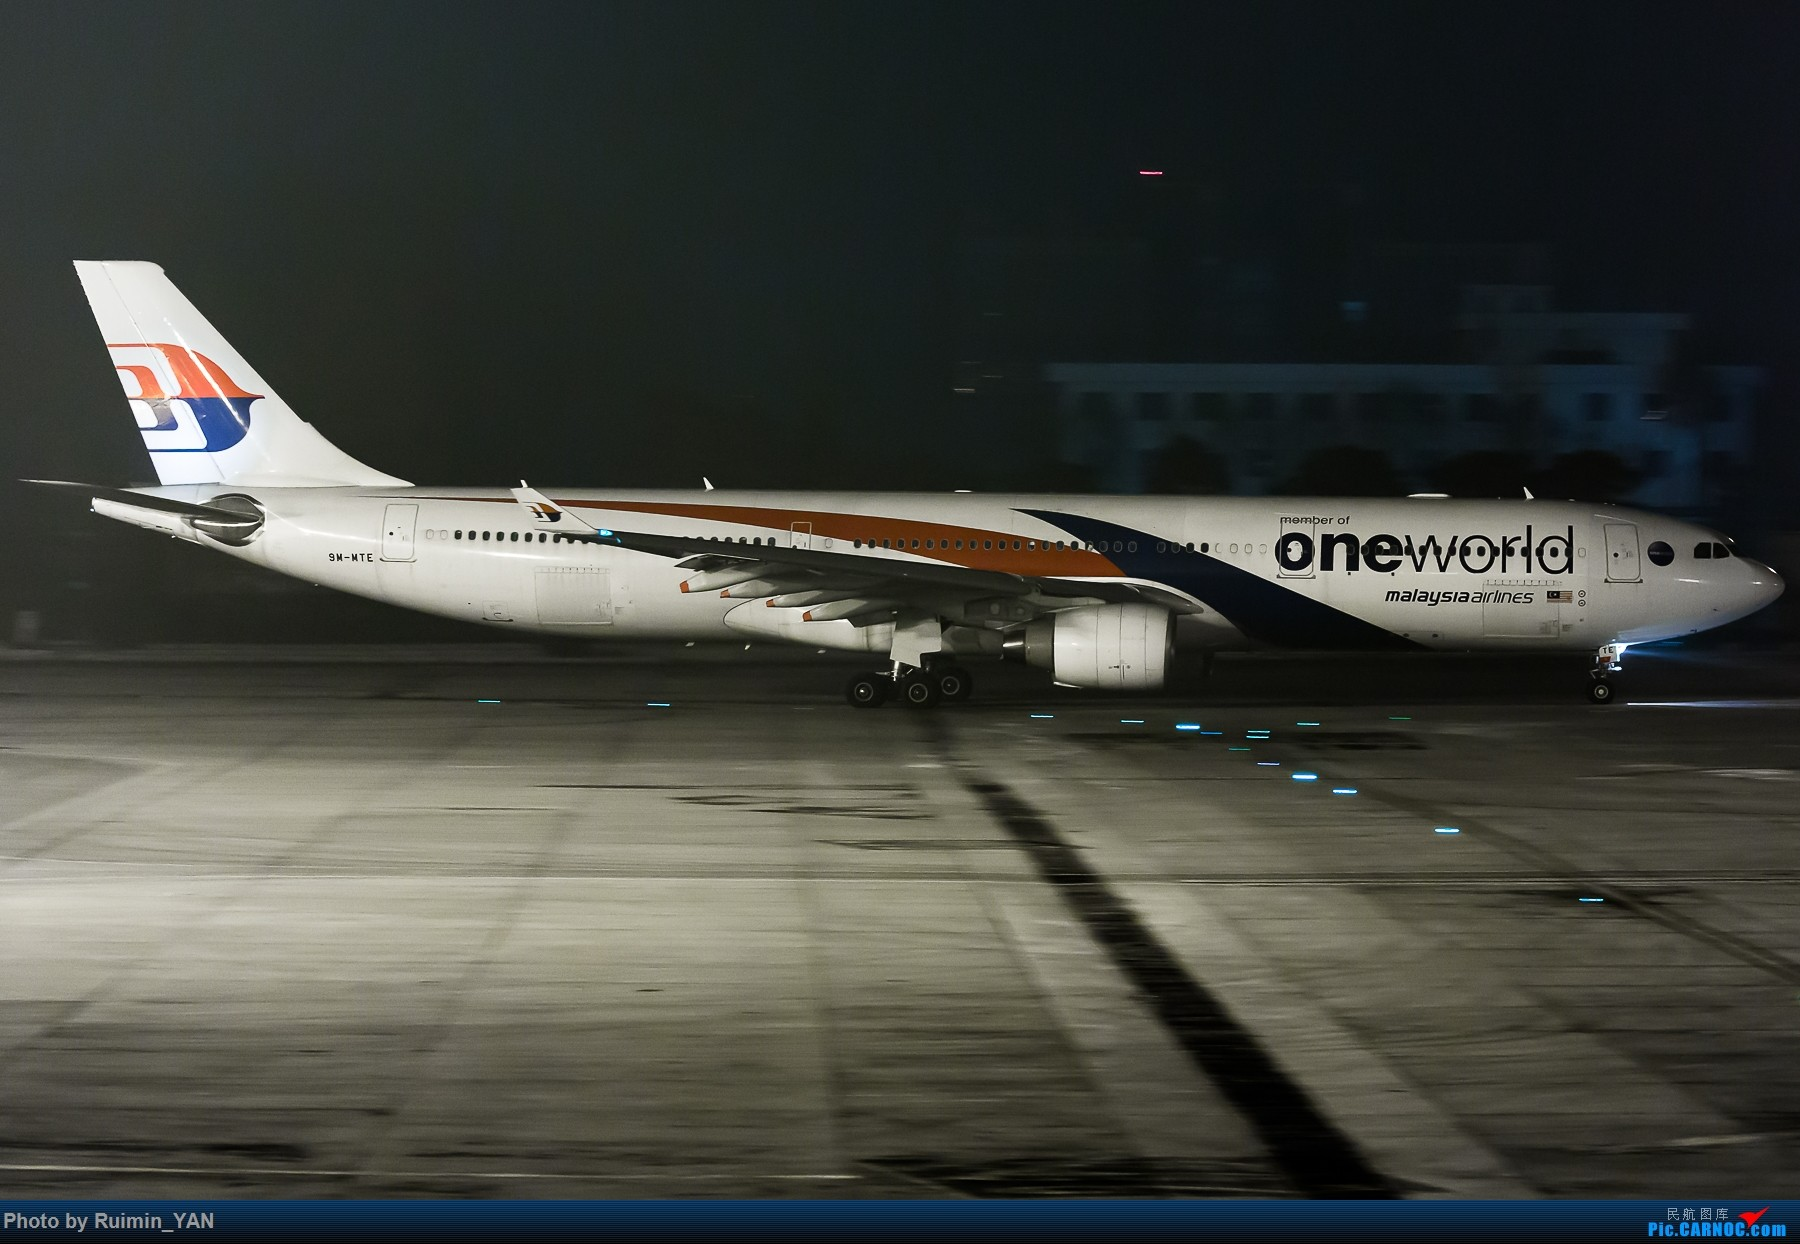 Re:[原创]【PEK飞友会】马航(寰宇一家oneworld成员)*4 AIRBUS A330-300 9M-MTE 中国北京首都国际机场